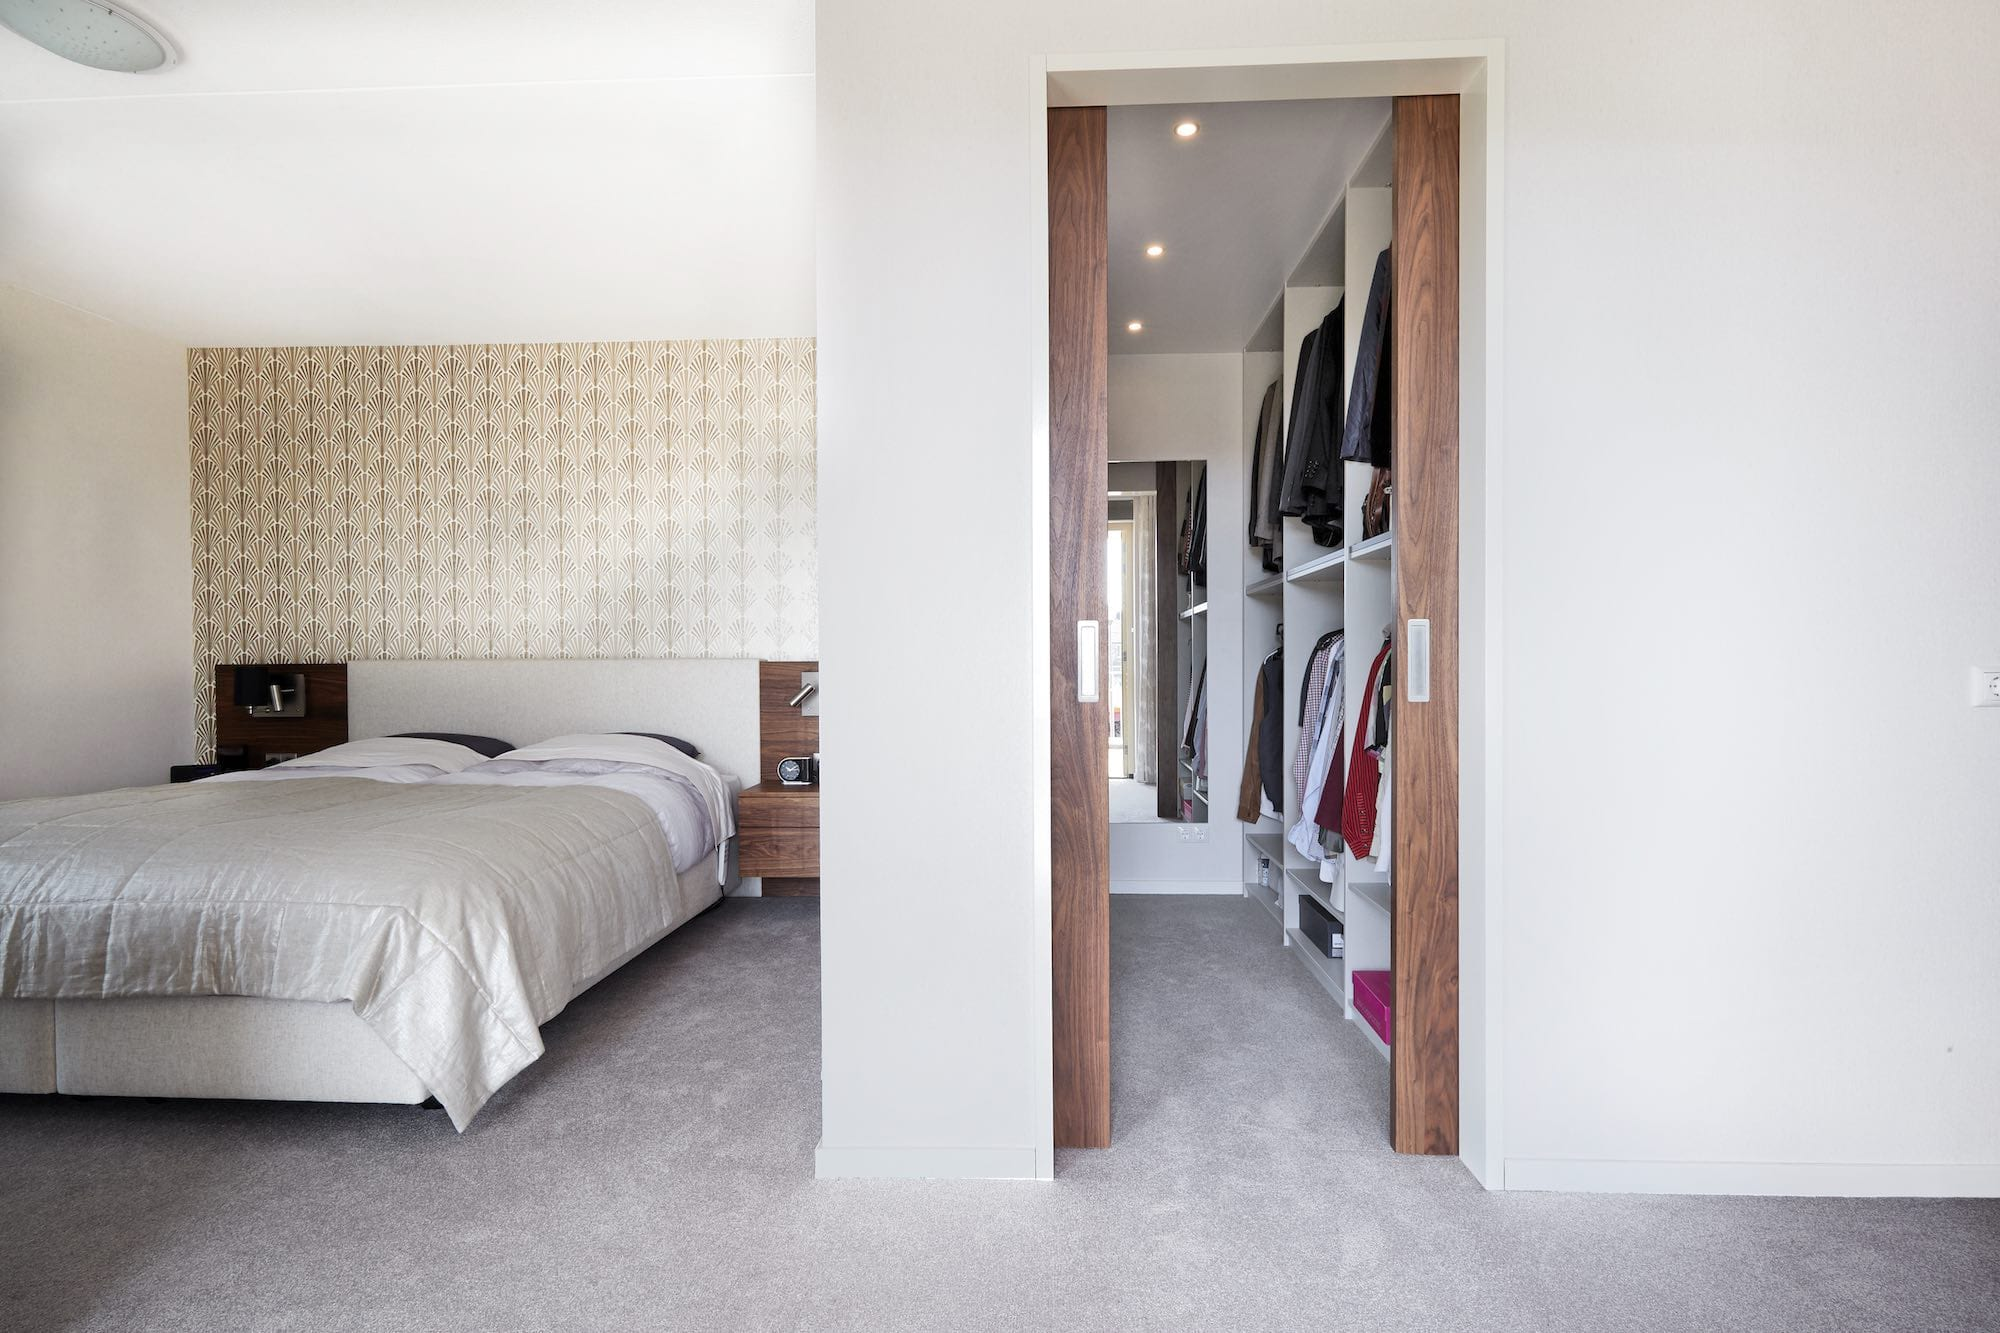 senioren slaapkamer met inloopkast